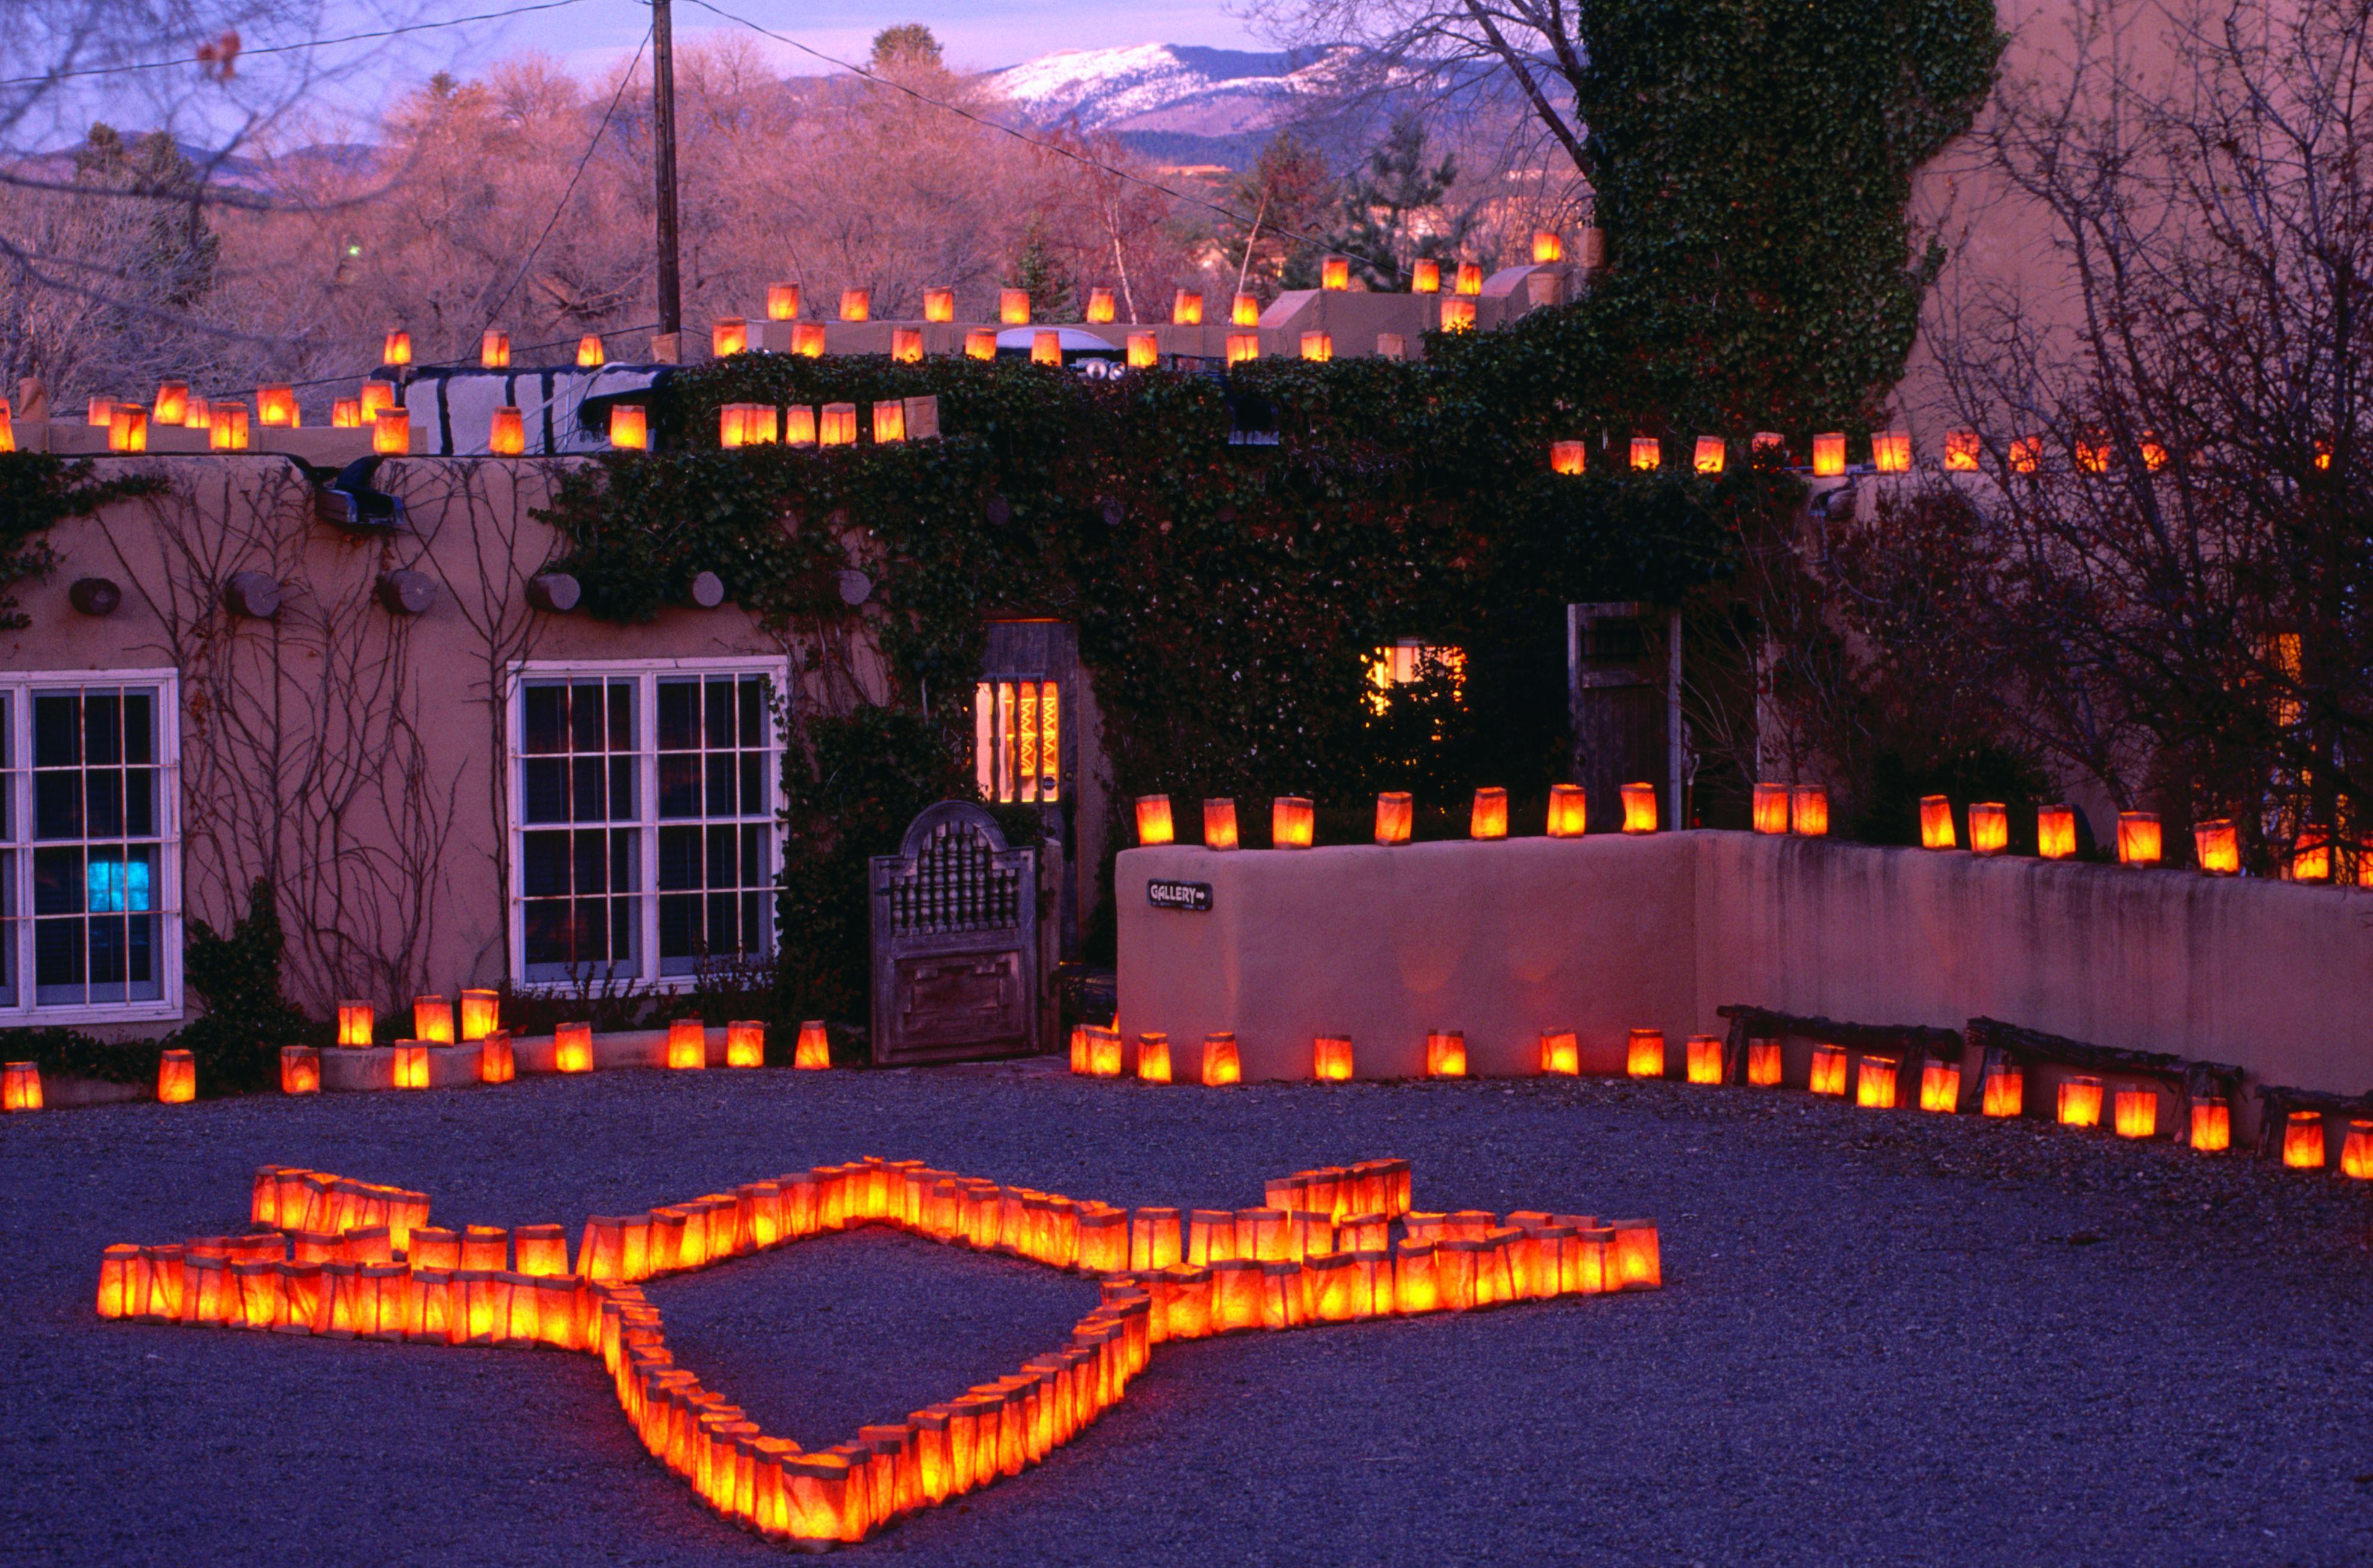 Christmas in the Southwest: Luminarias and Farolitos